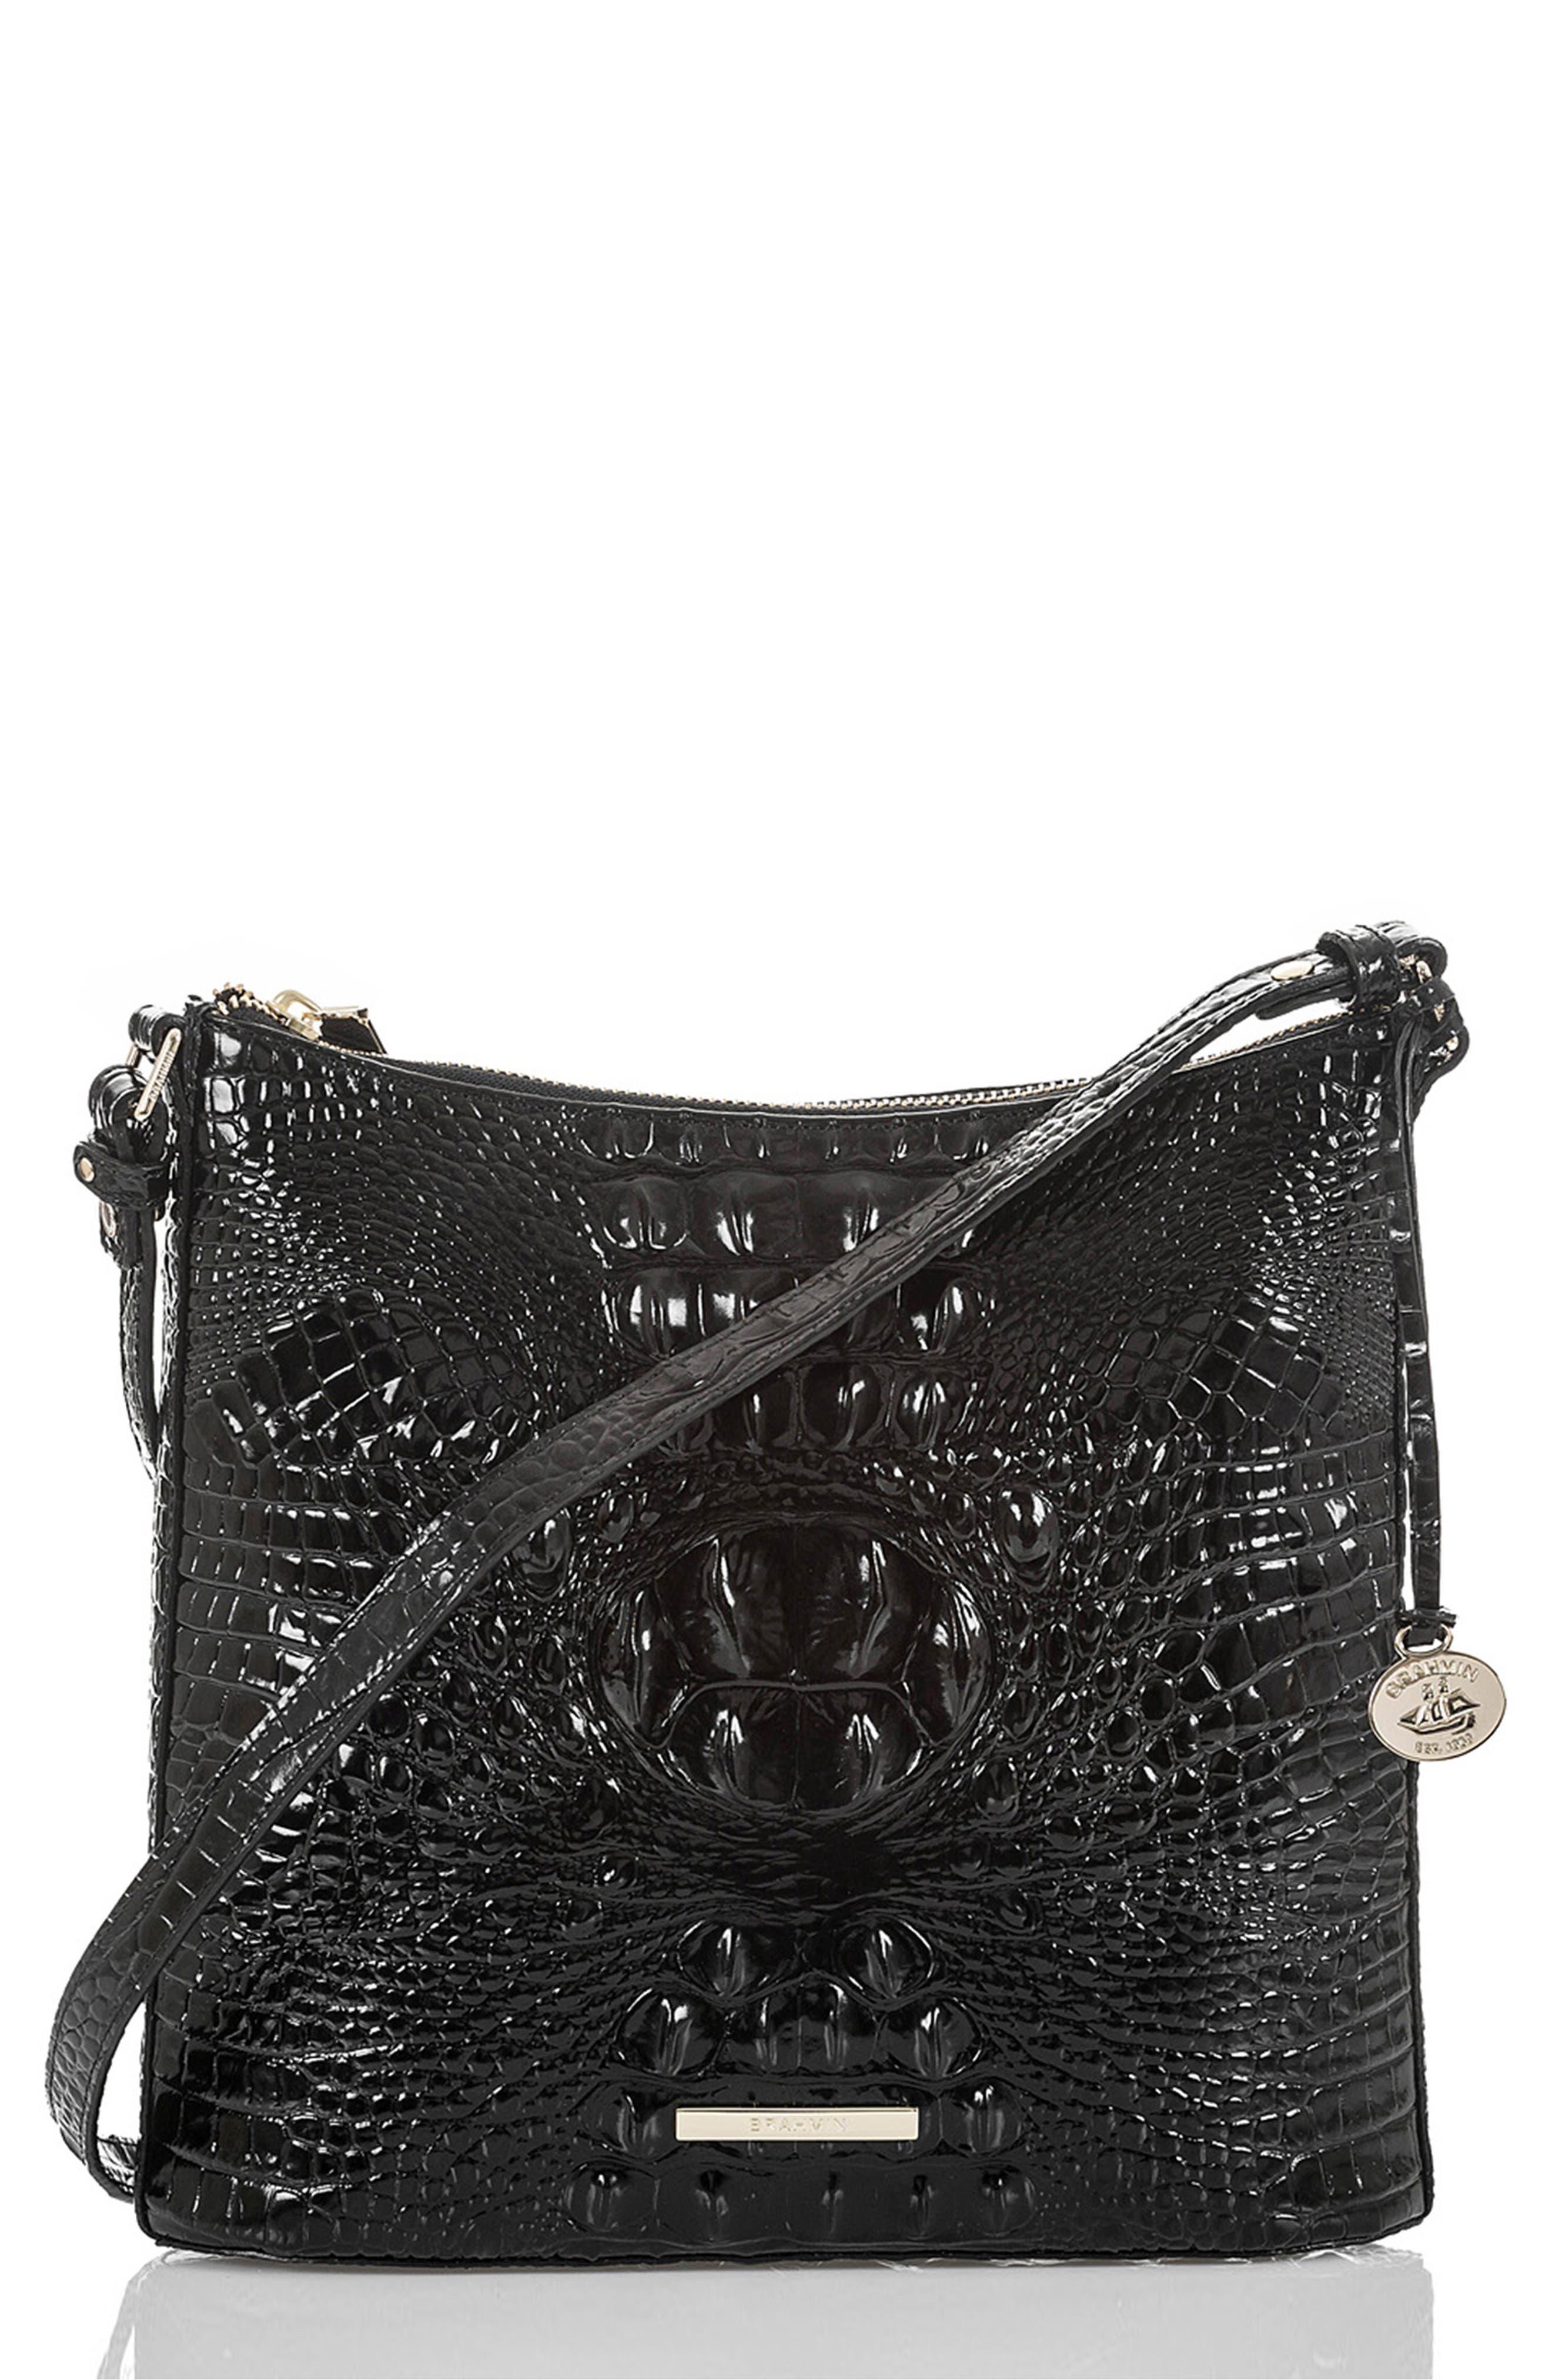 BRAHMIN Katie Croc Embossed Leather Crossbody Bag, Main, color, BLACK MEMBOURNE